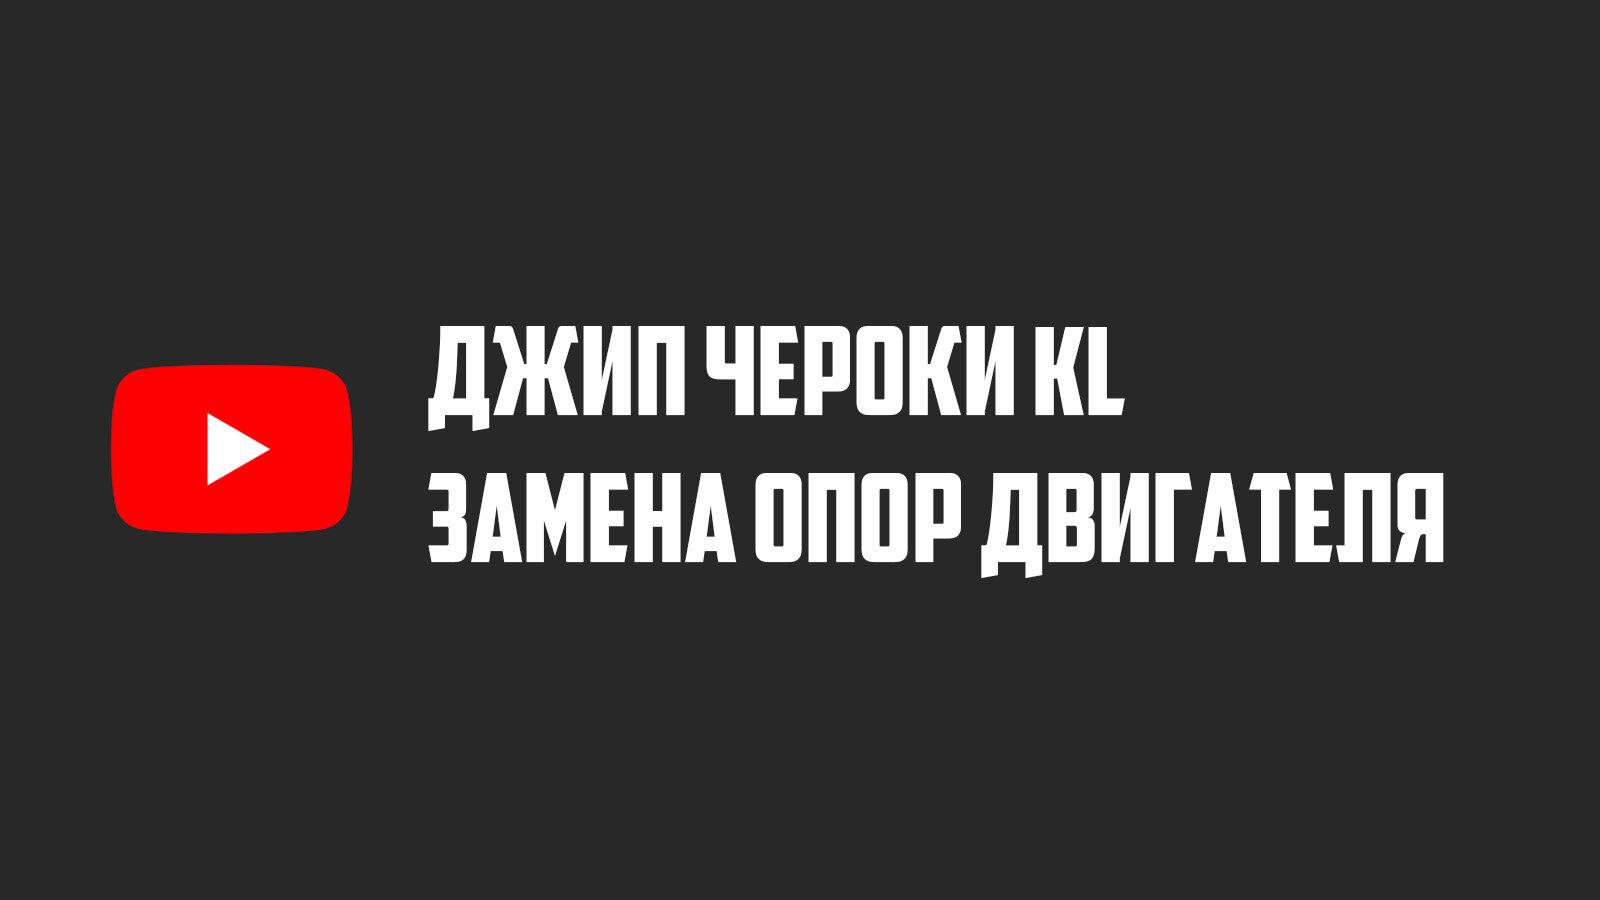 Опоры двигателя Джип Чероки KL